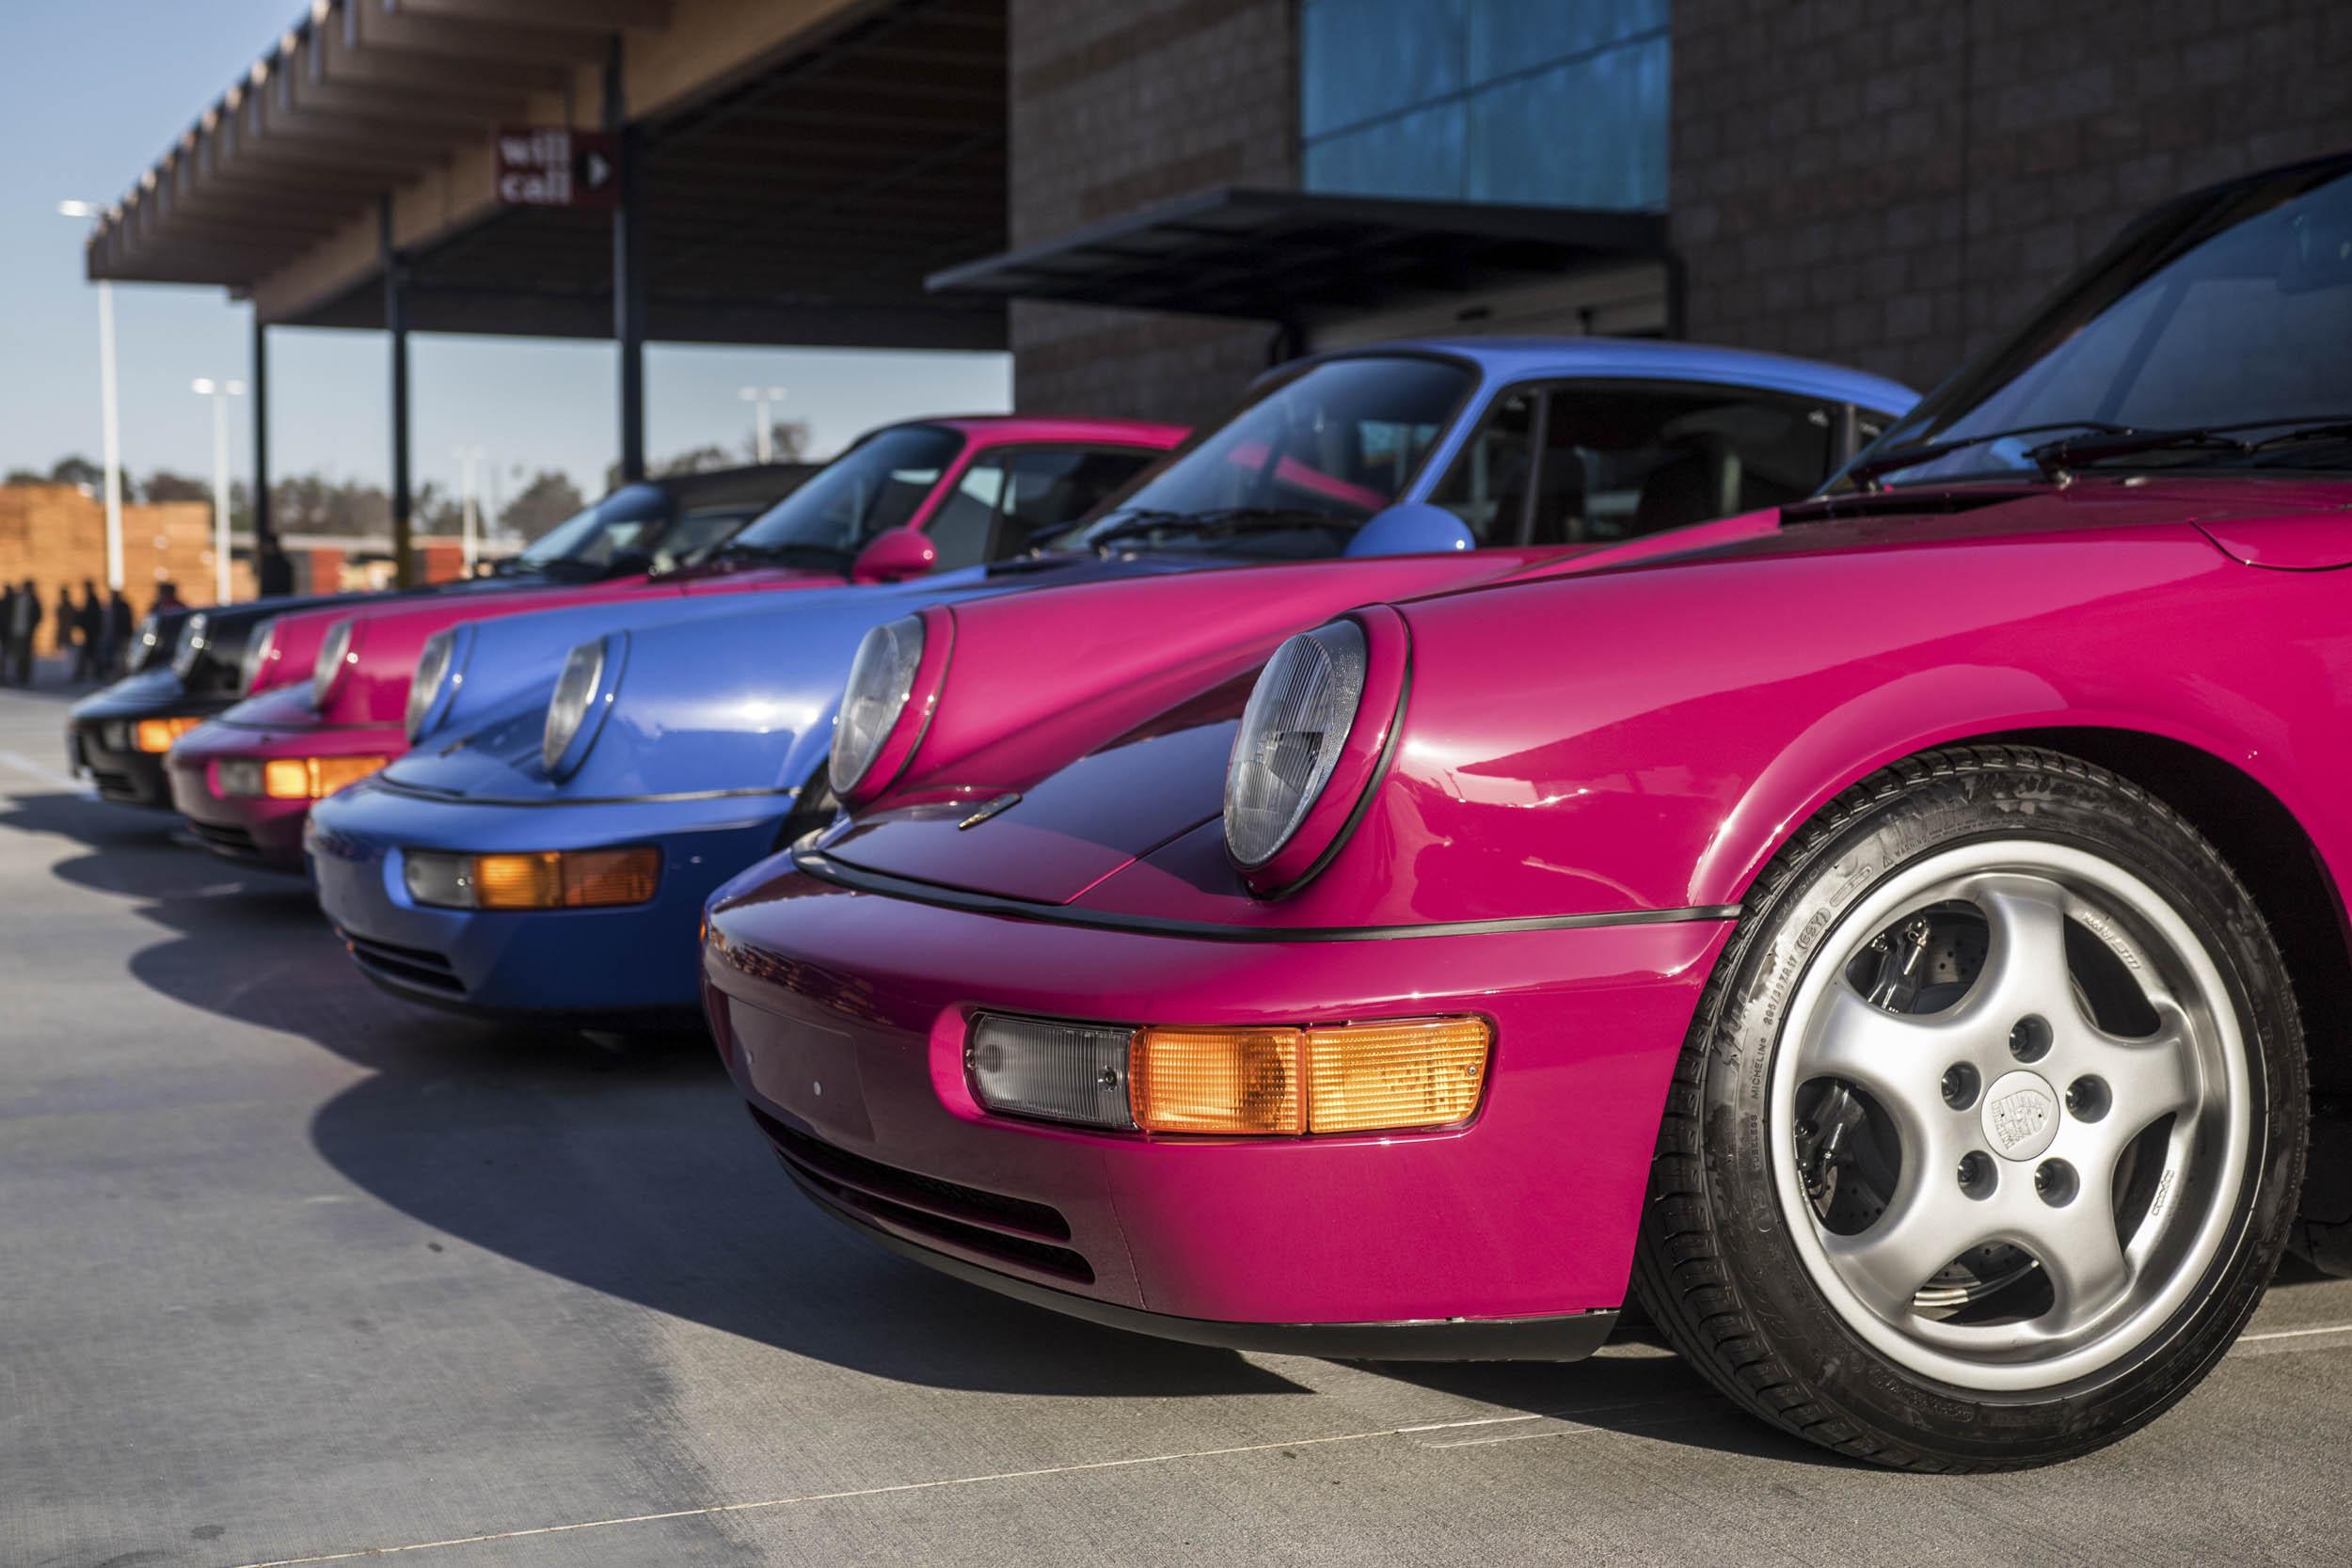 Luftgekühlt: An automotive music festival where Porsches sing thumbnail